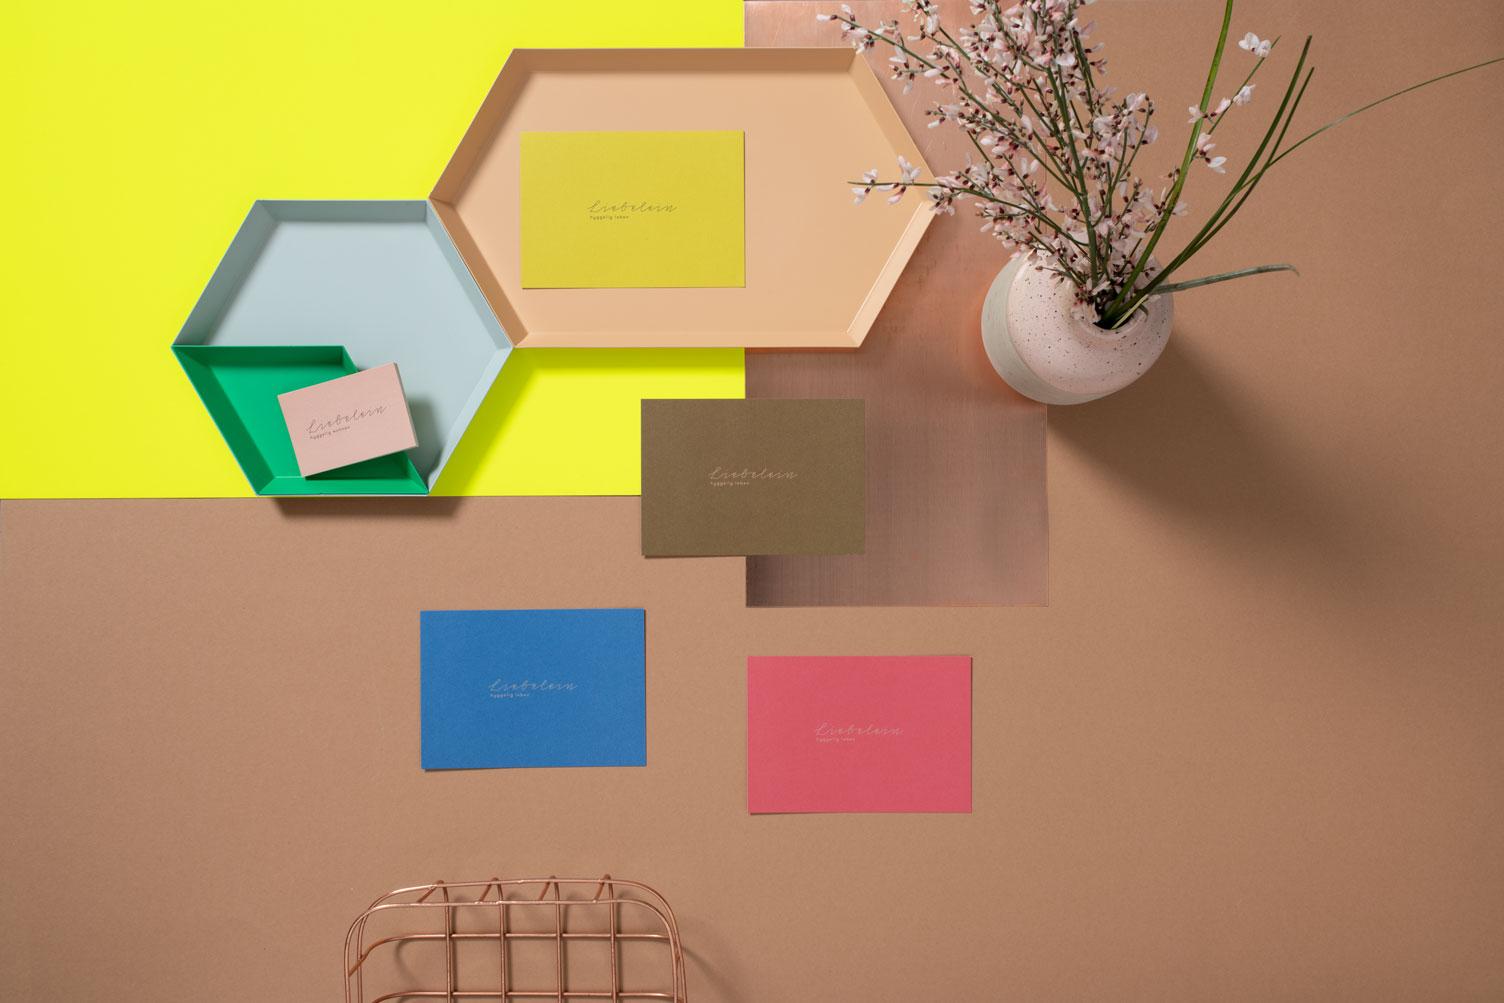 Store, pop-up Store, Corporate Design, hyggelig wohnen, Visitenkarte, Accesoires